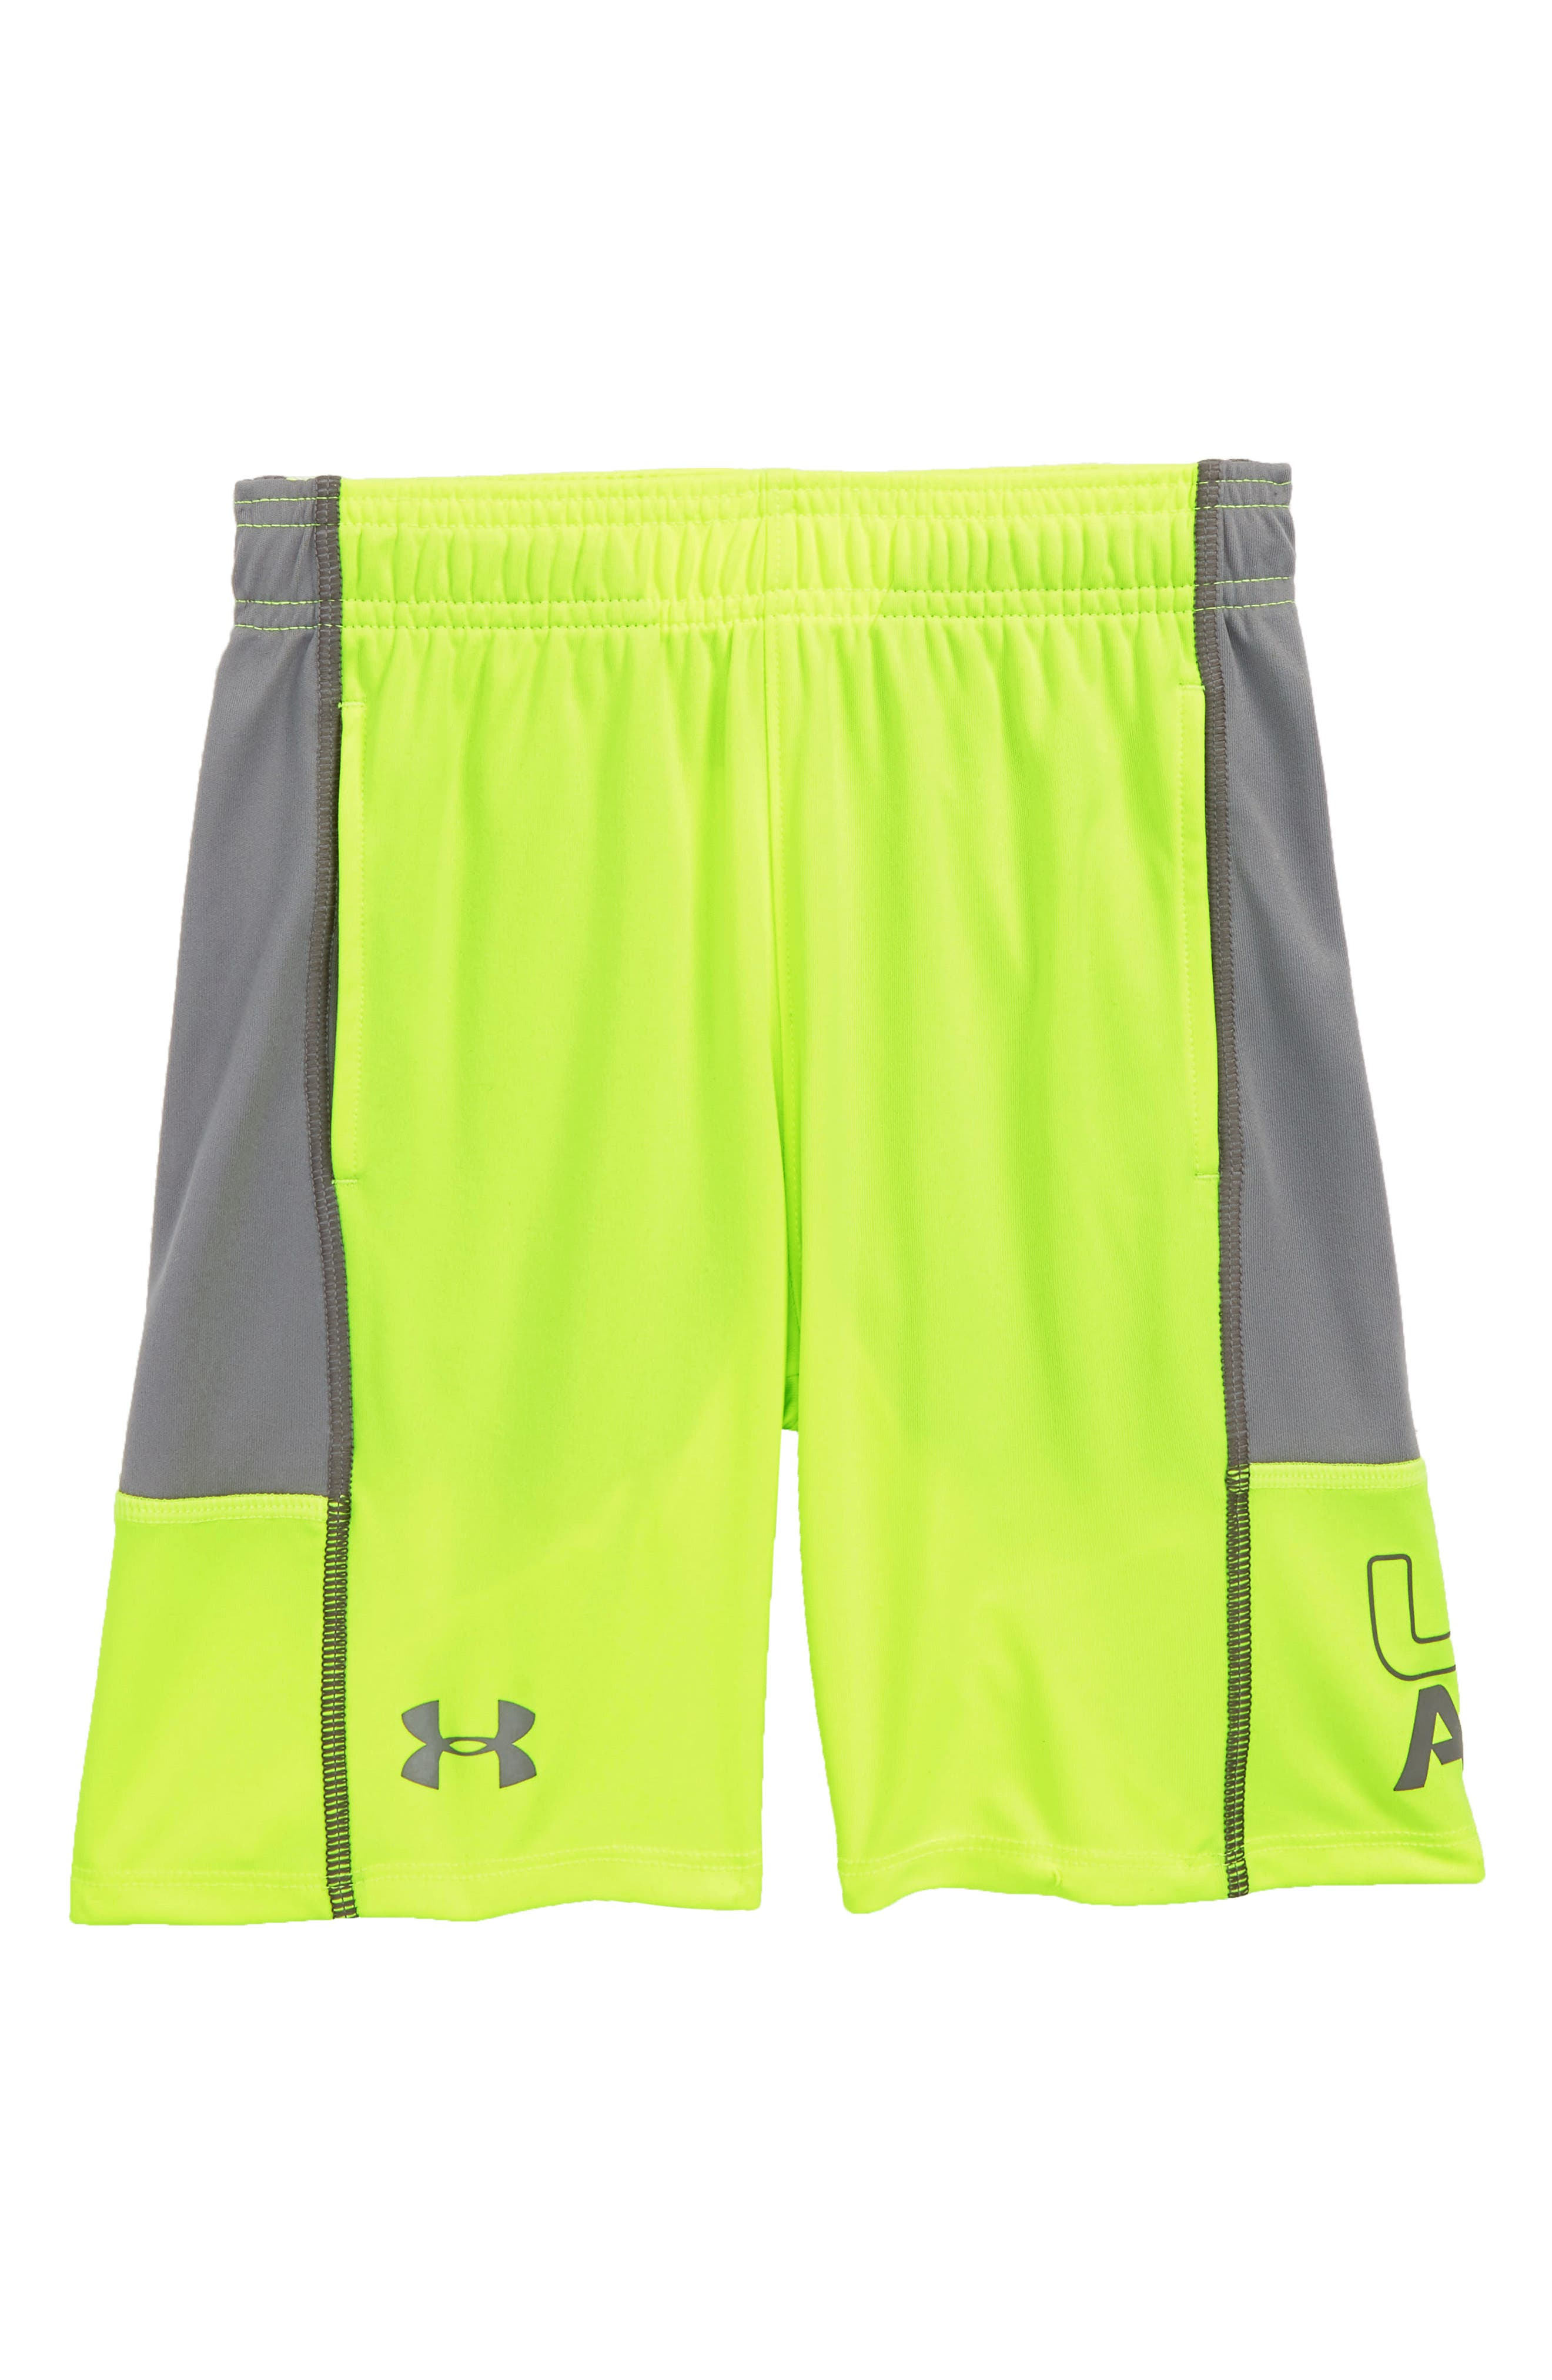 Stunt Shorts,                         Main,                         color, Hi Vis Yellow Distinction